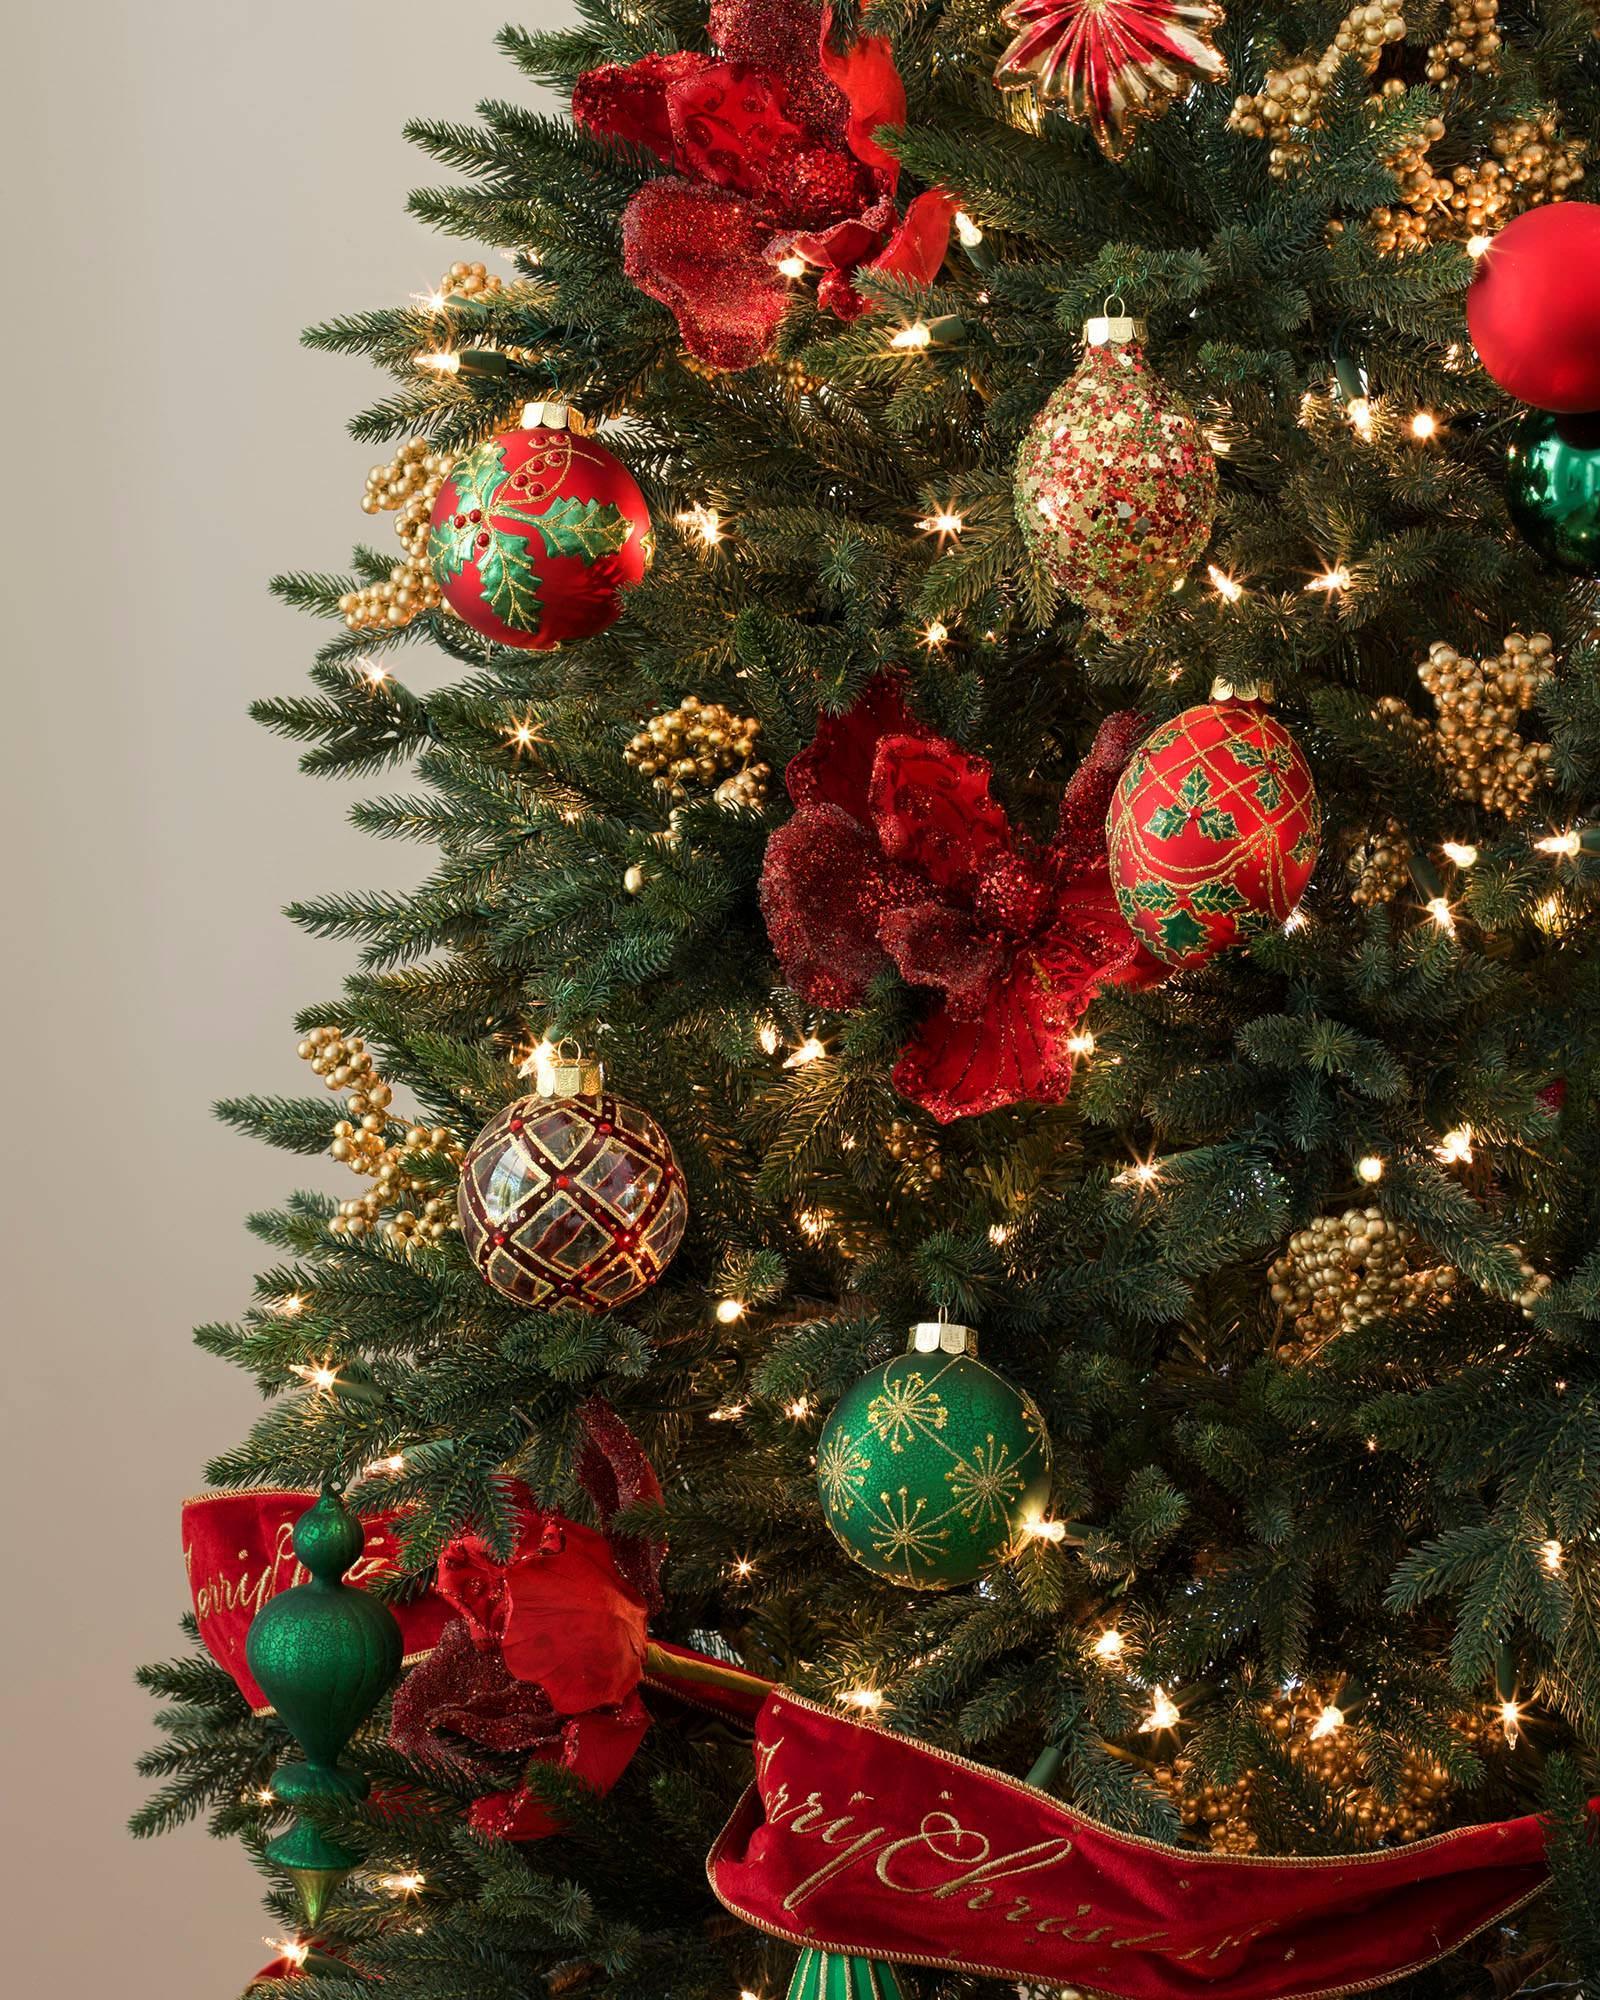 Christmas ornament sets for tree -  Christmas Cheer Ornament Set Alt